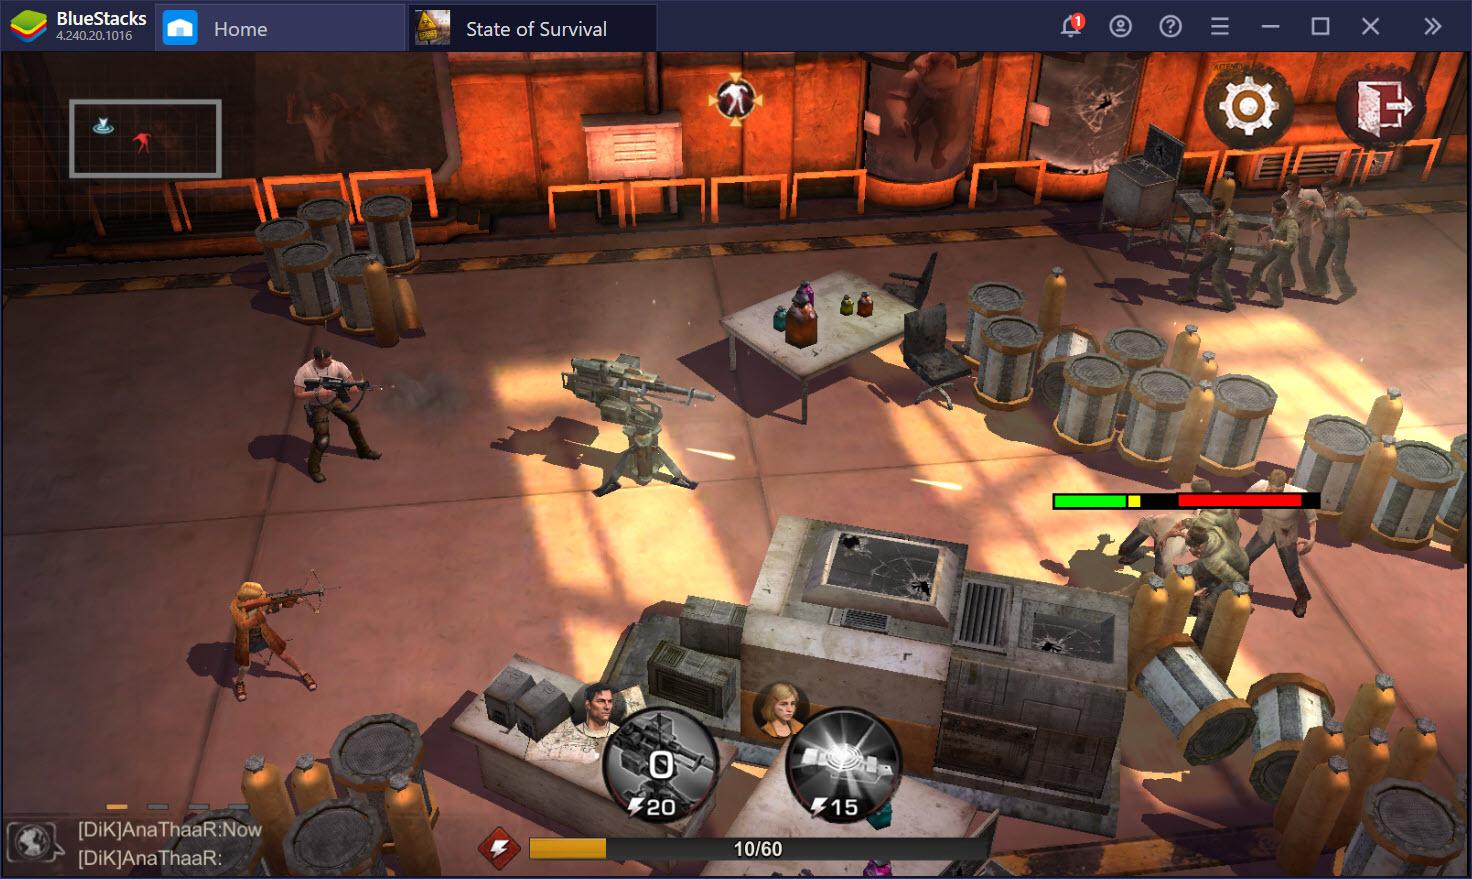 State of Survival: Sinh tồn trong thế giới zombie chết chóc cùng BlueStacks